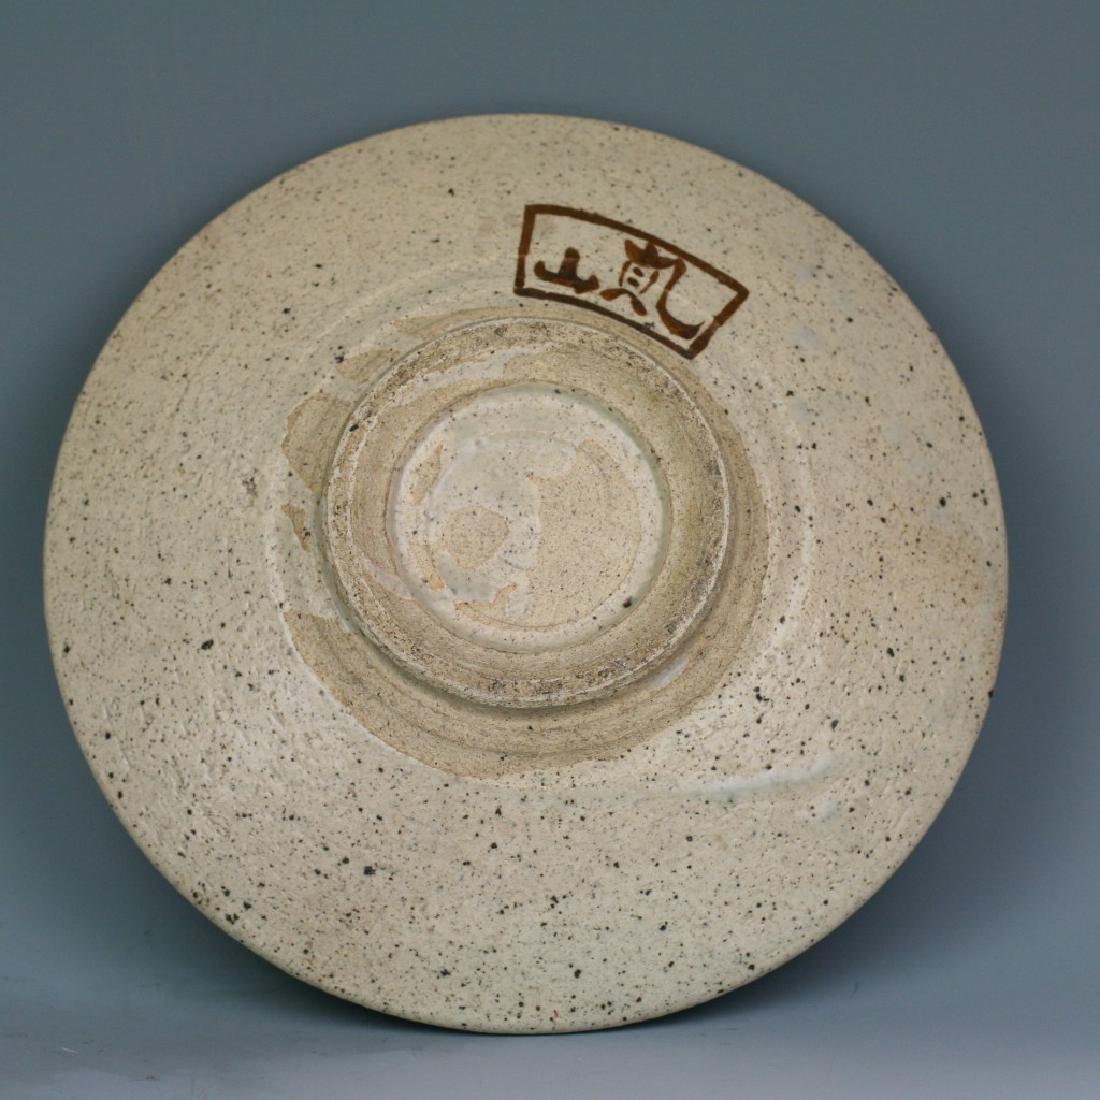 Two Japanese Ceramic Plates, An Imari & A Studio - 5